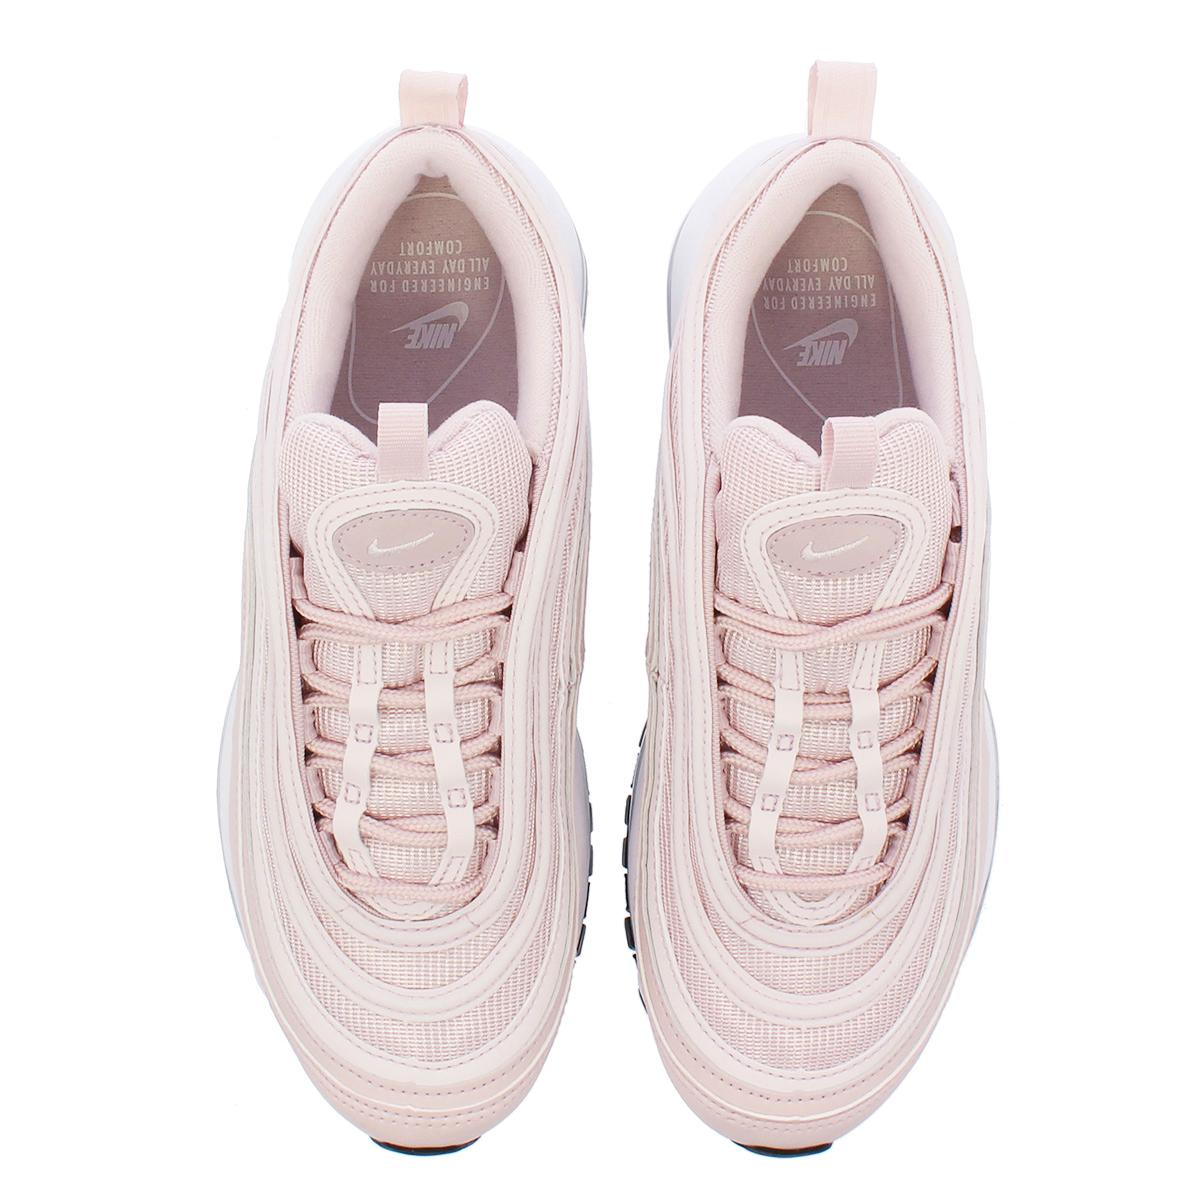 Women's OFF white x Nike Air Max 97 Pink White Black 921733 600 Girls Running Shoes 921733 600